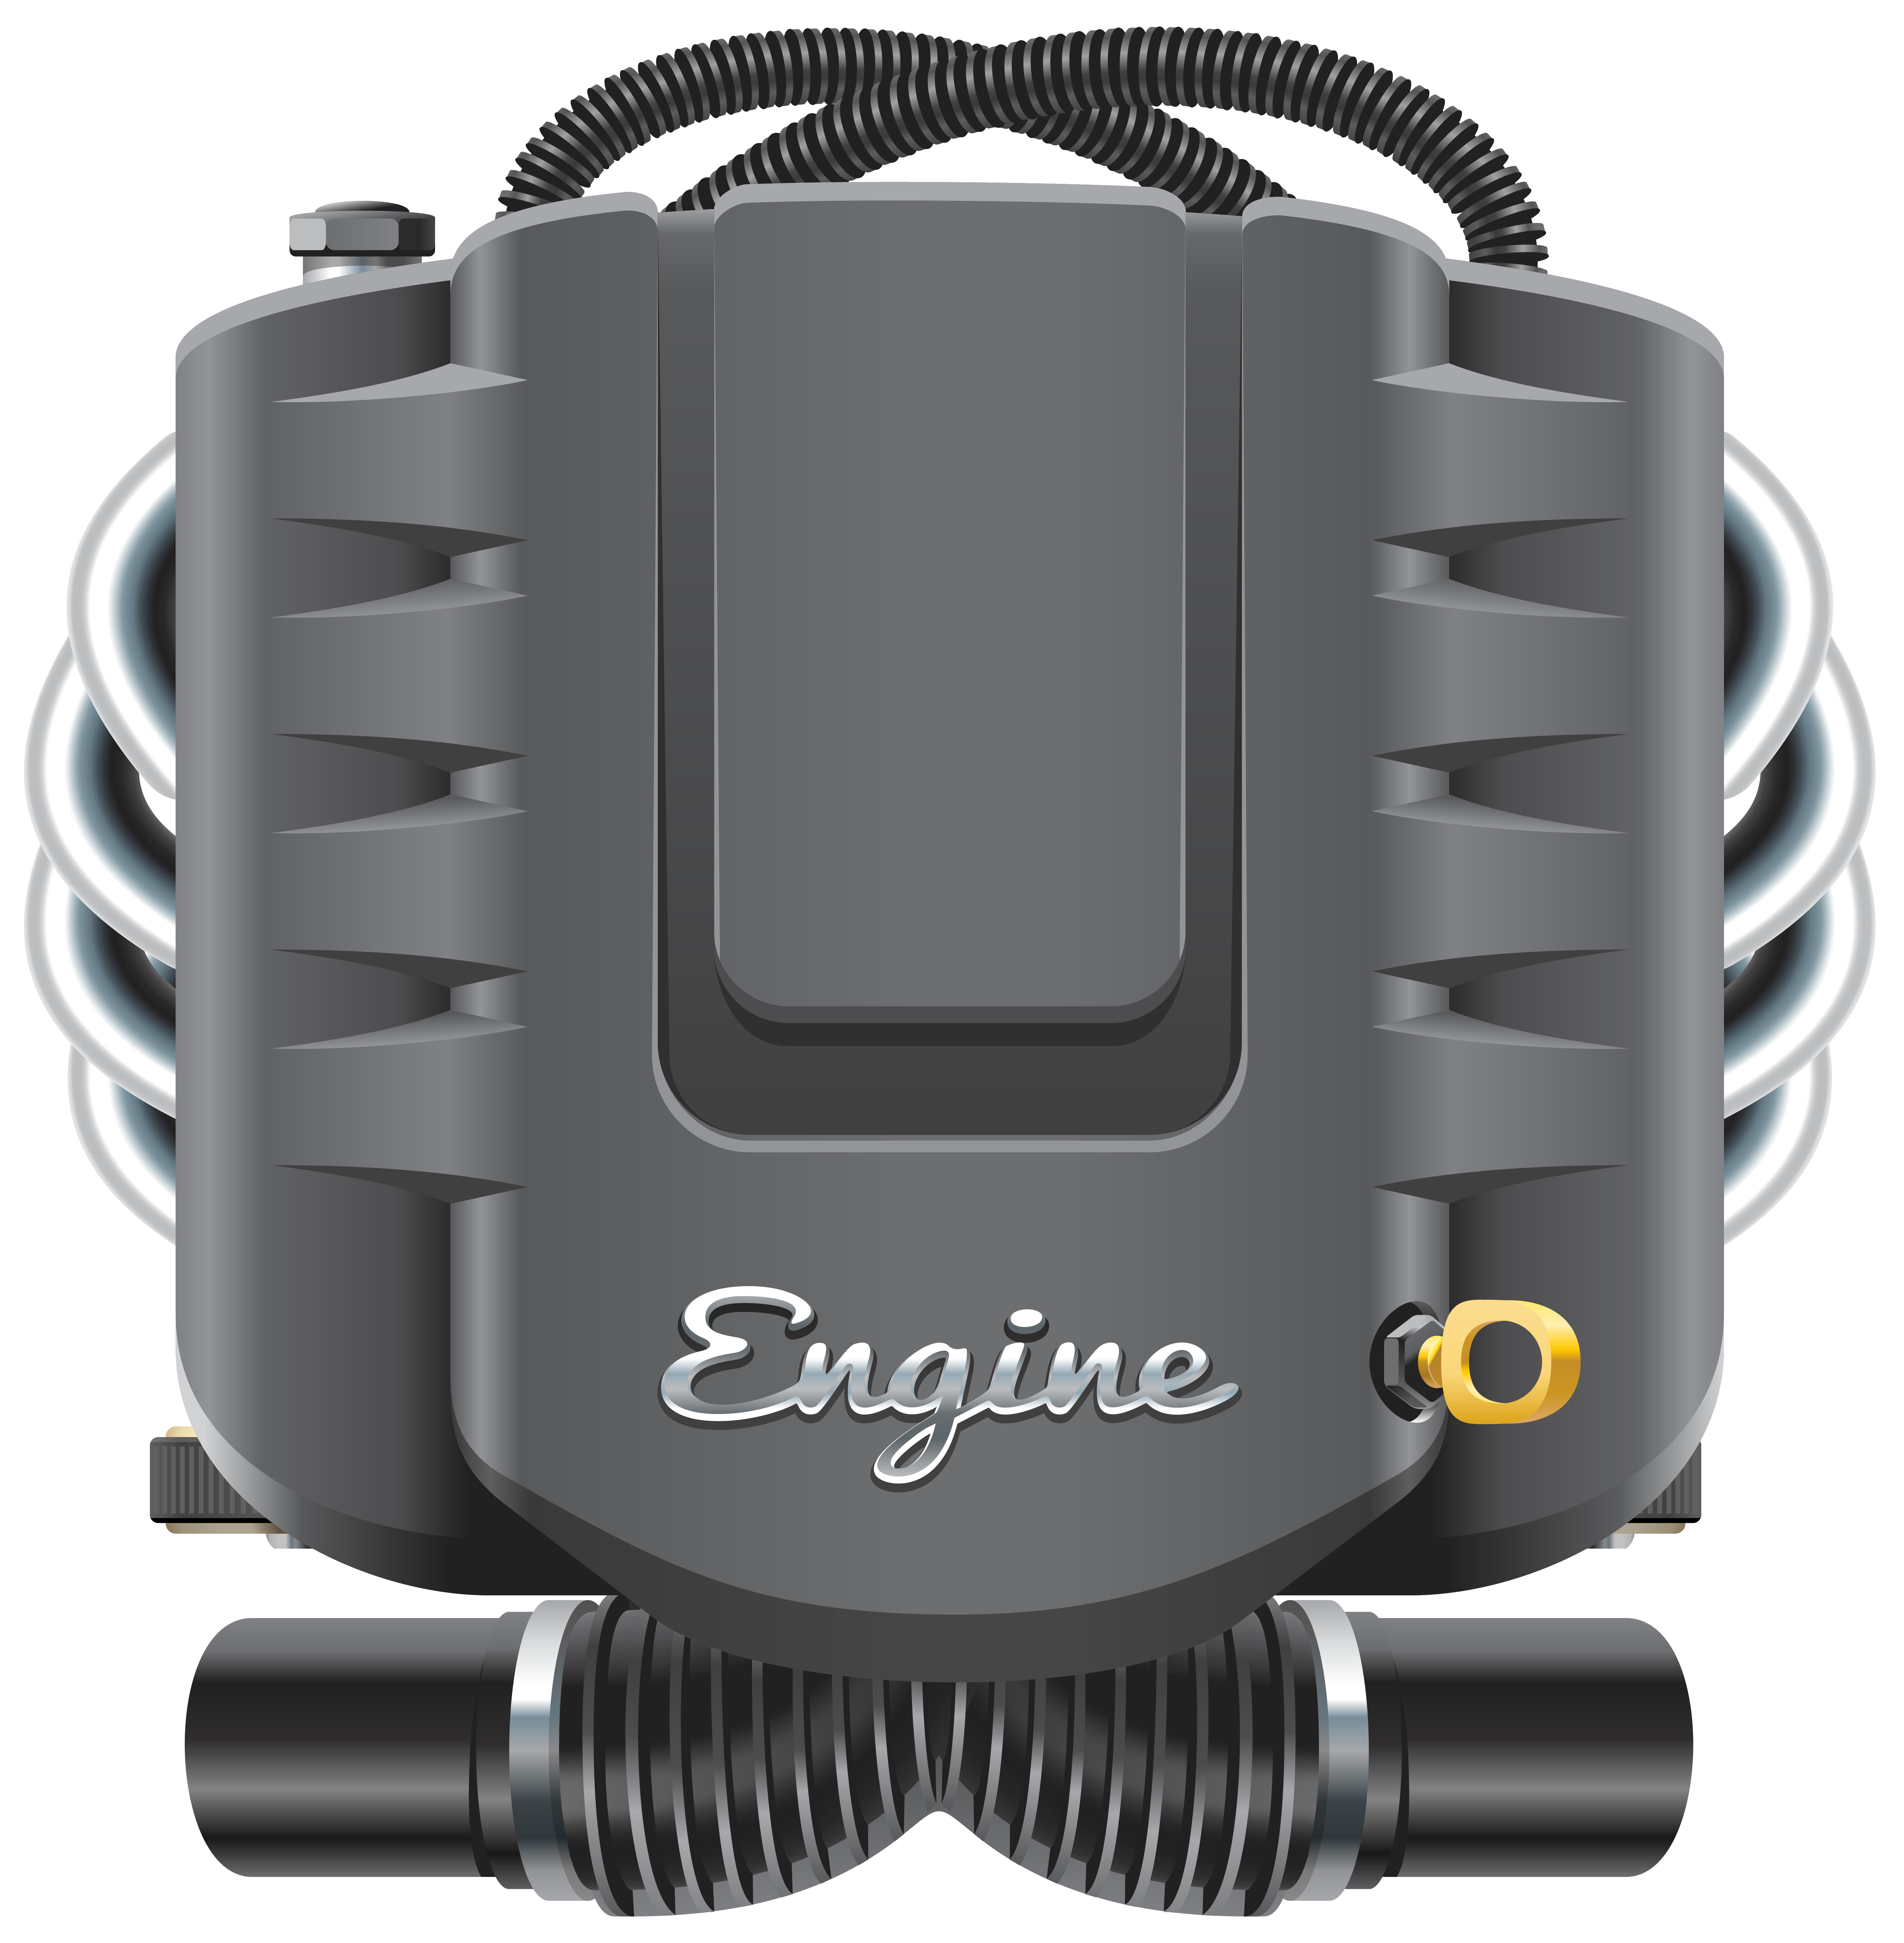 Car engine clipart picture transparent download Engine PNG Clip Art - Best WEB Clipart picture transparent download